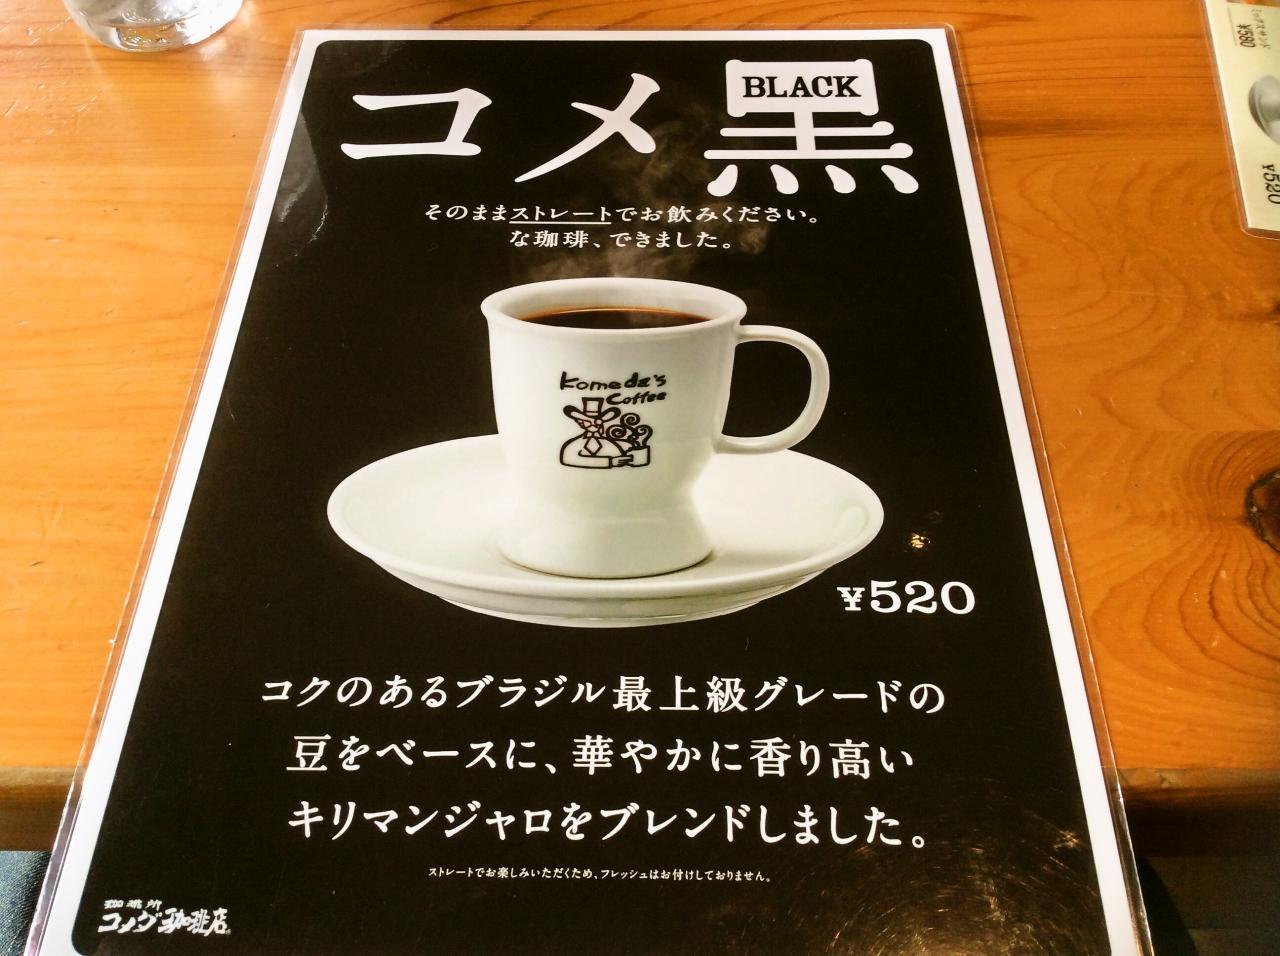 珈琲所 コメダ珈琲店 横浜江田店(店舗)